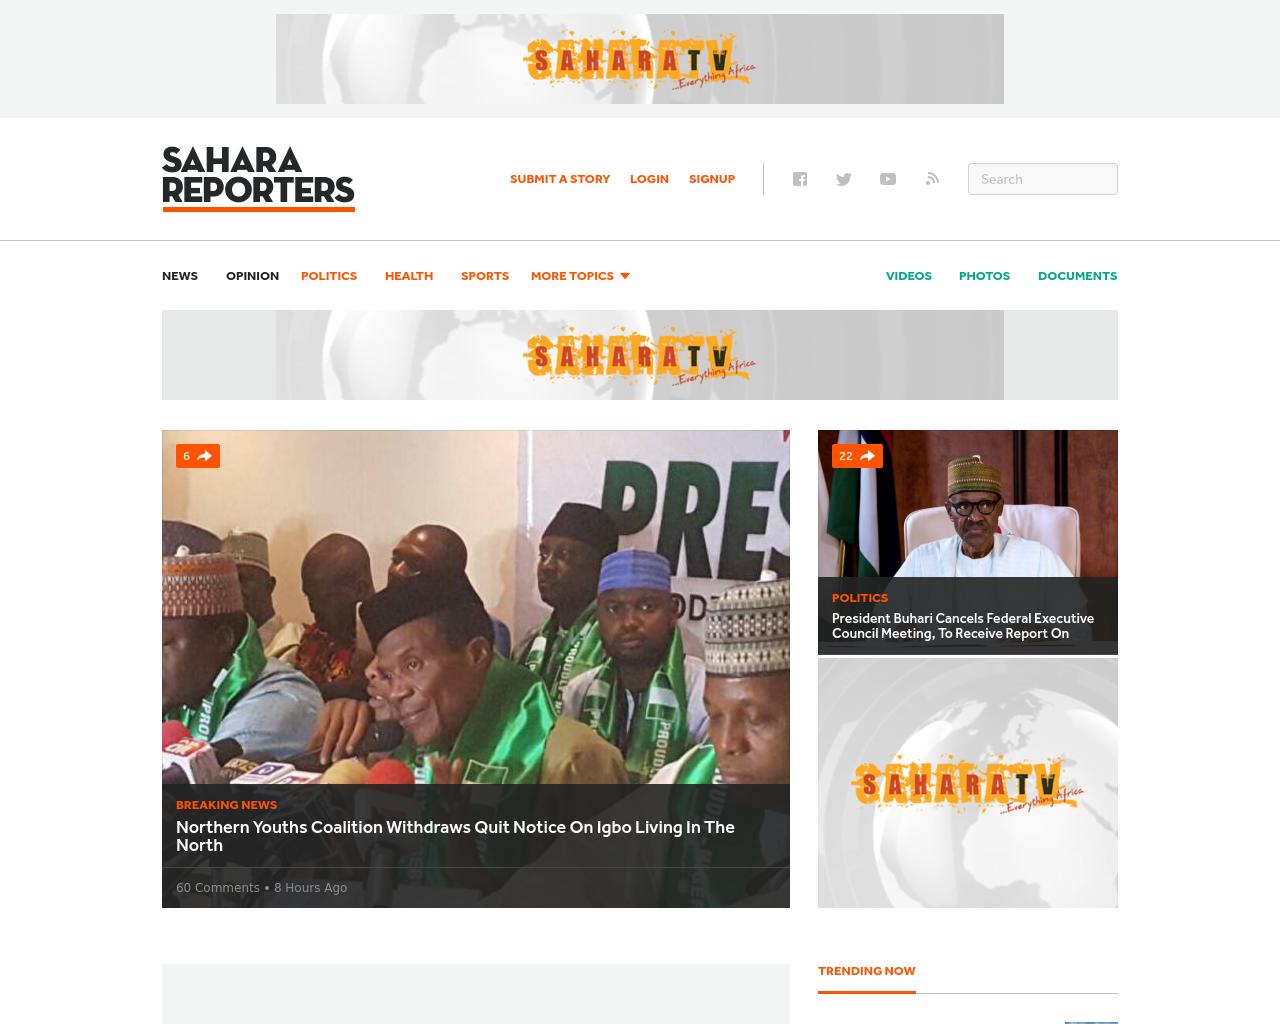 Sahara-Reporters-Advertising-Reviews-Pricing